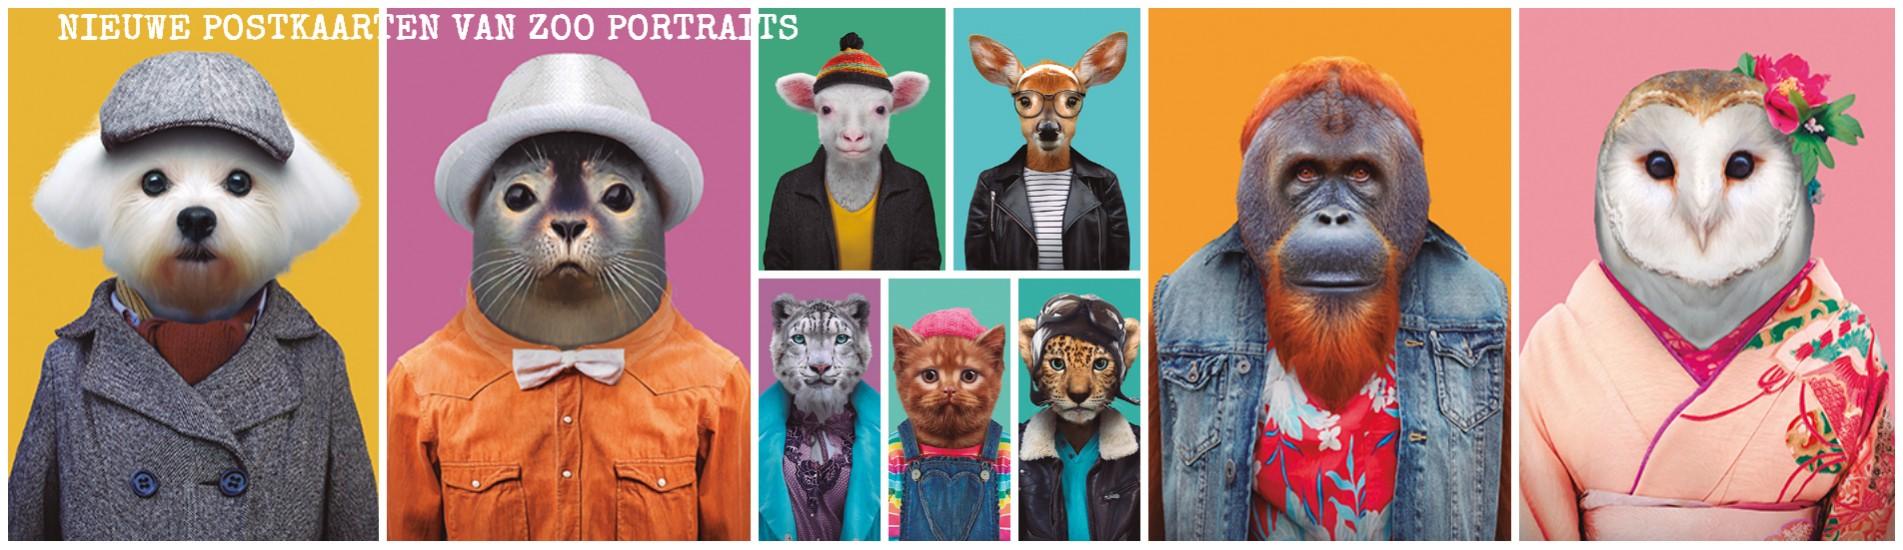 banner-postkaarten-ansichtkaarten-zoo-portraits